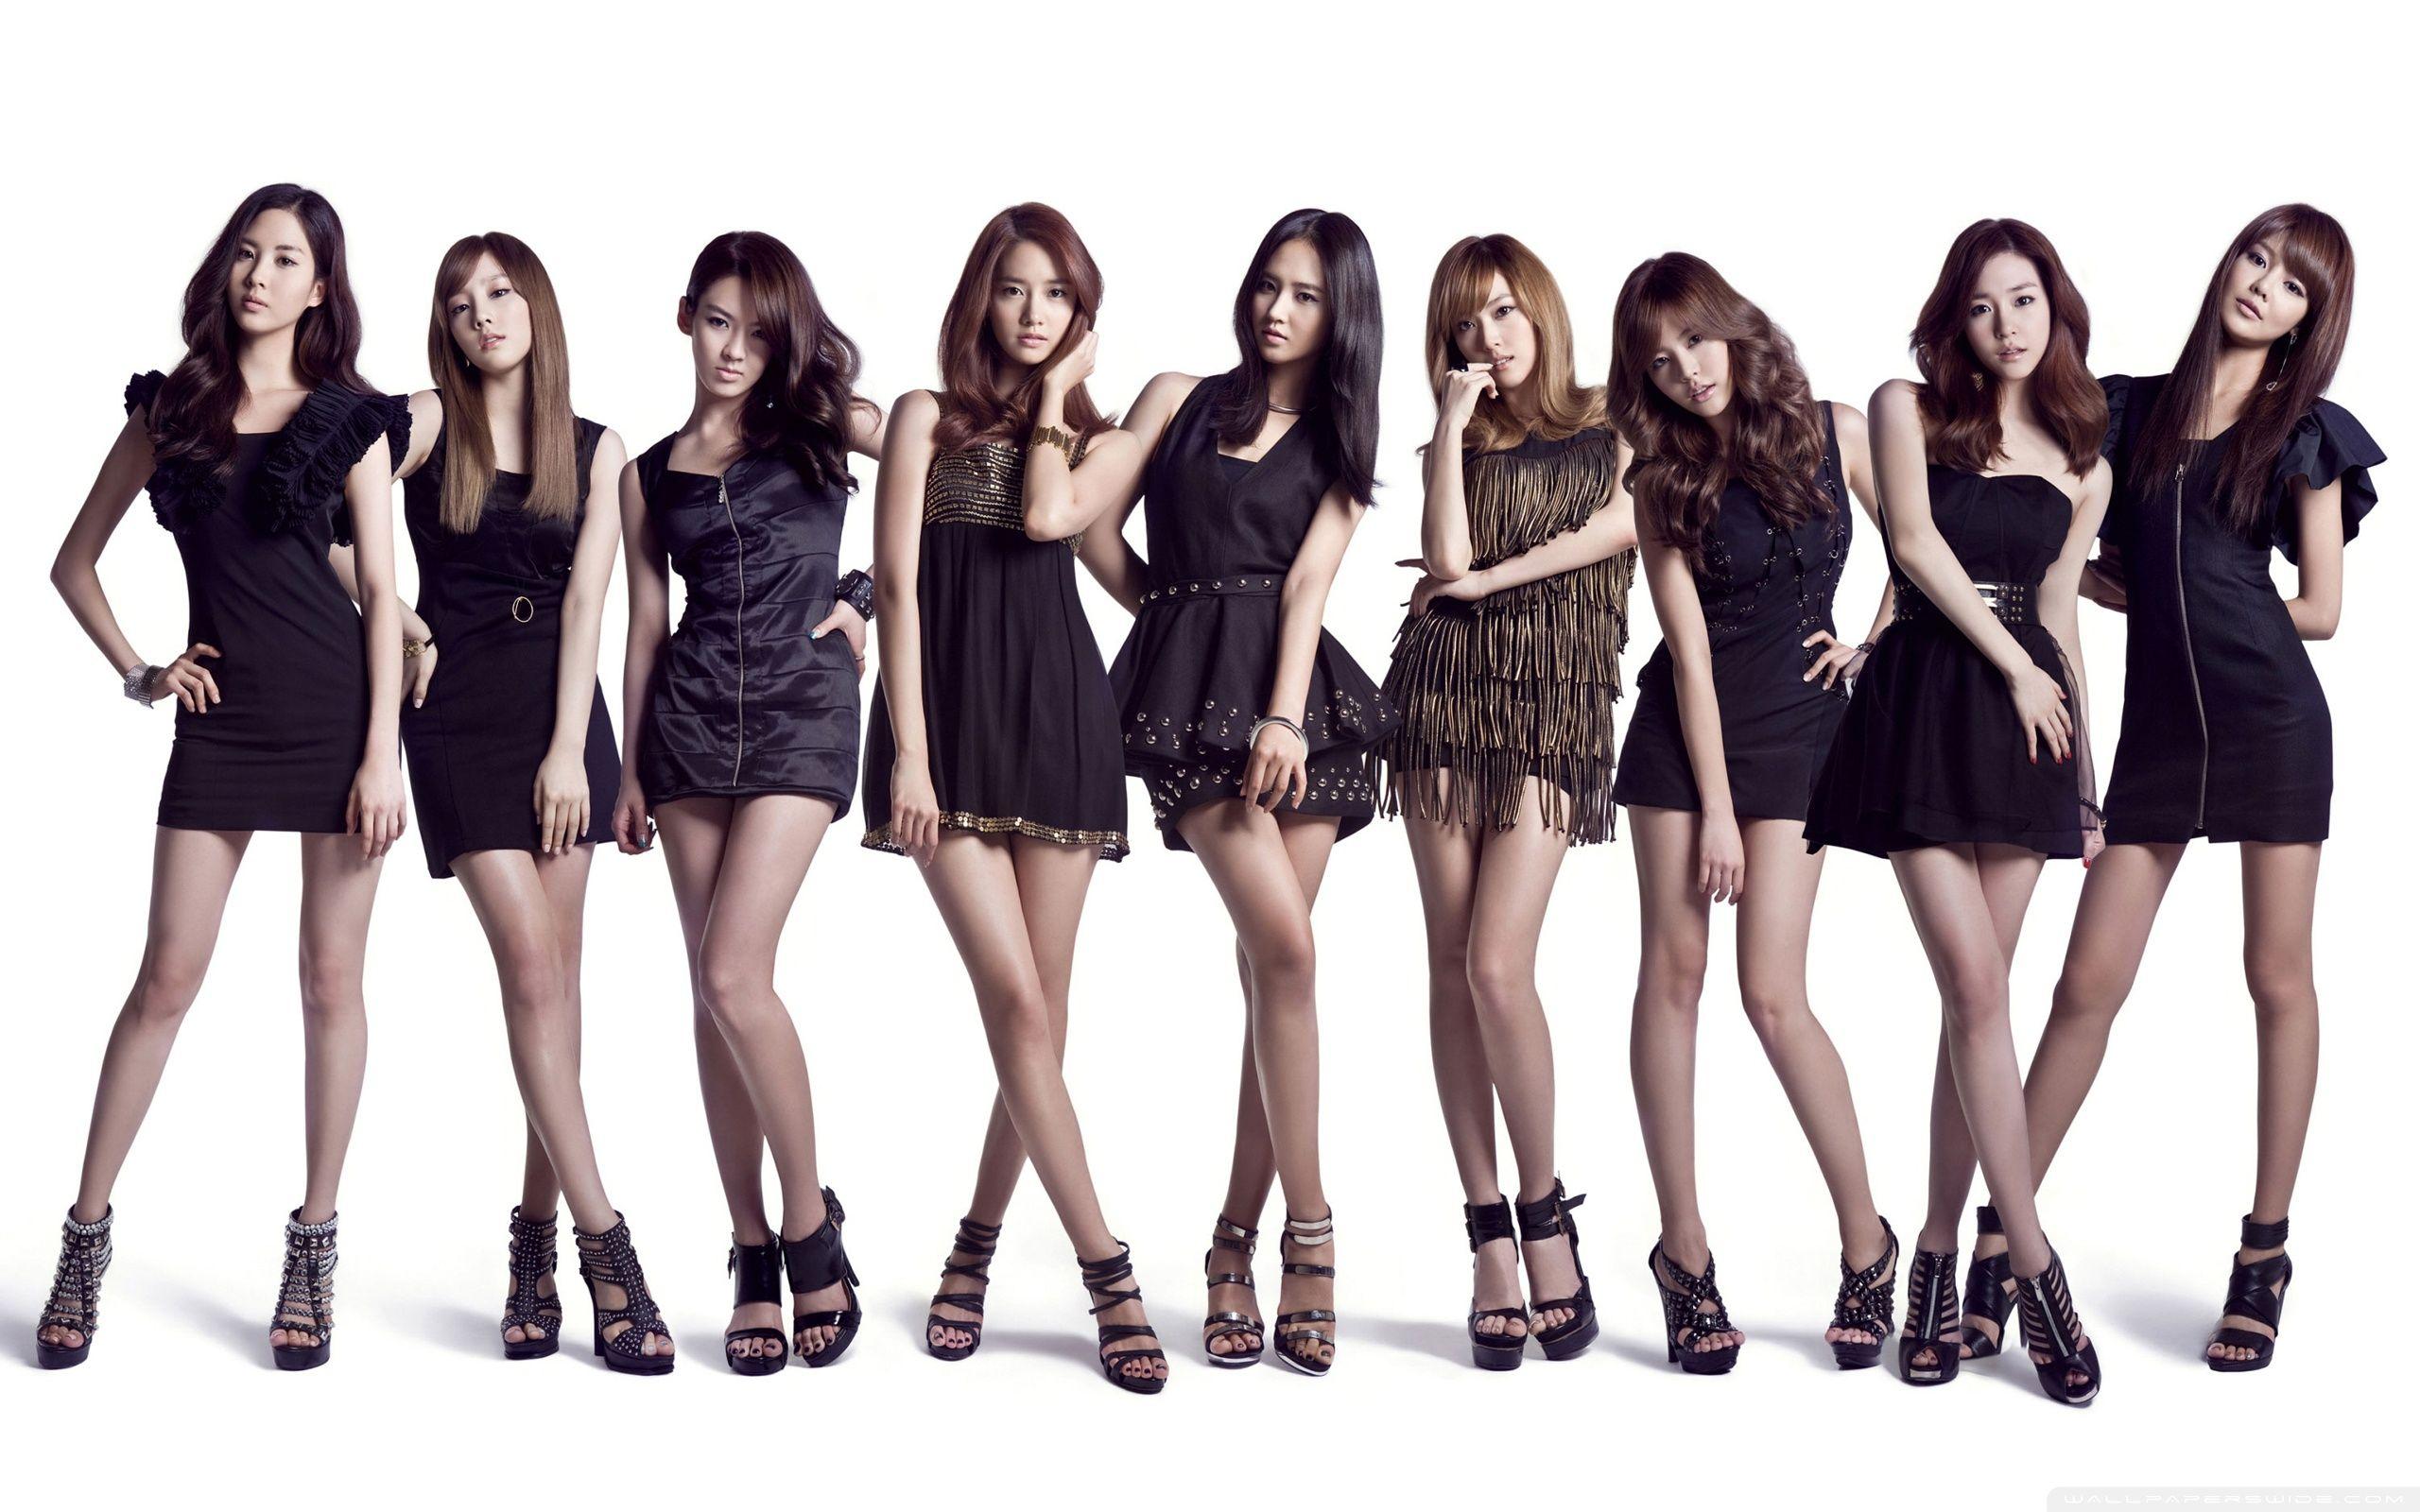 group-girls-black